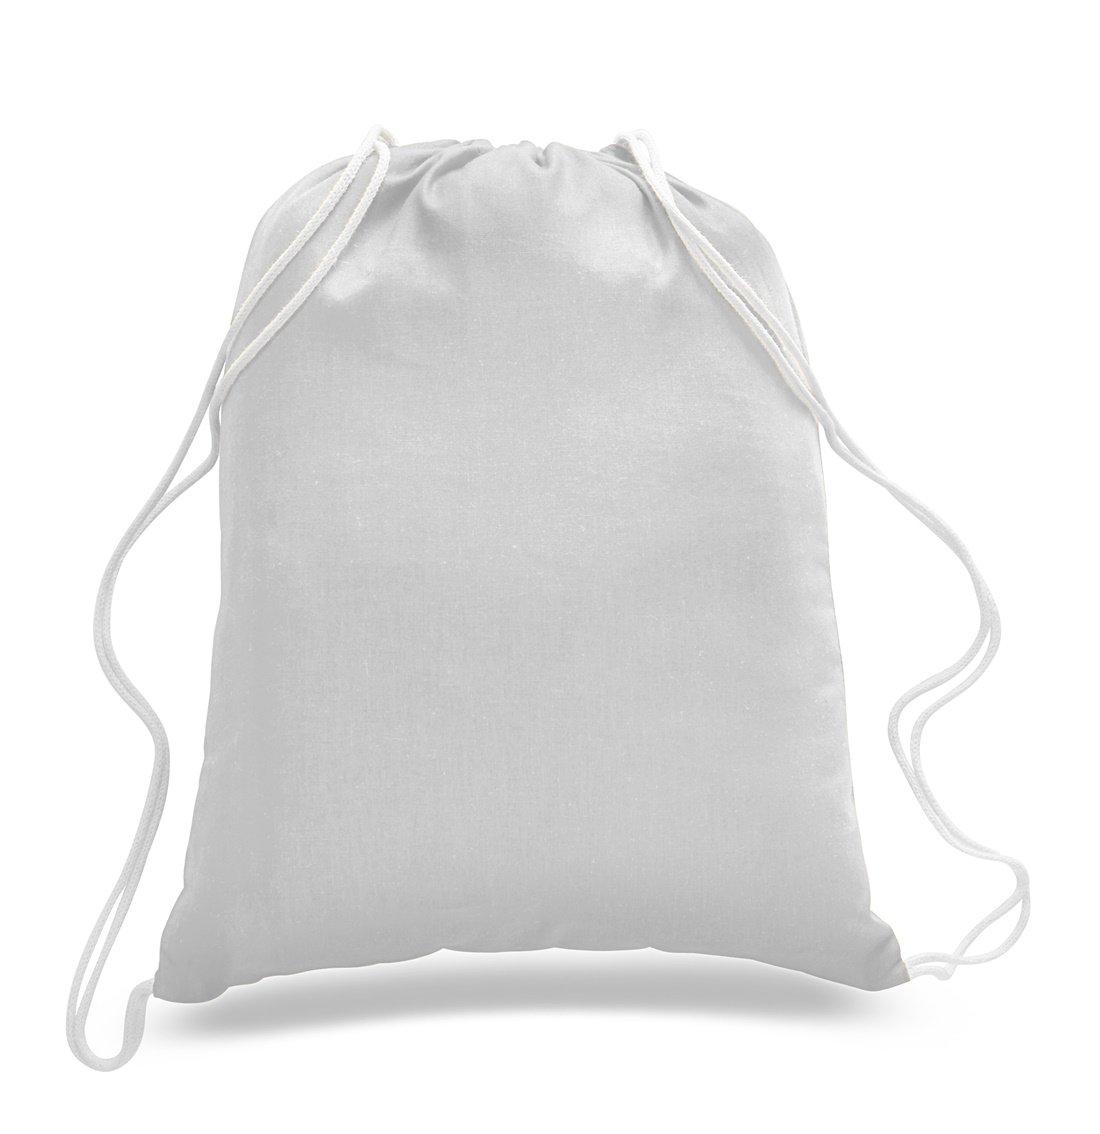 c37636e23d Amazon.com  (12 Pack) 1 Dozen - Durable Cotton Drawstring Tote Bags  (White)  Home   Kitchen